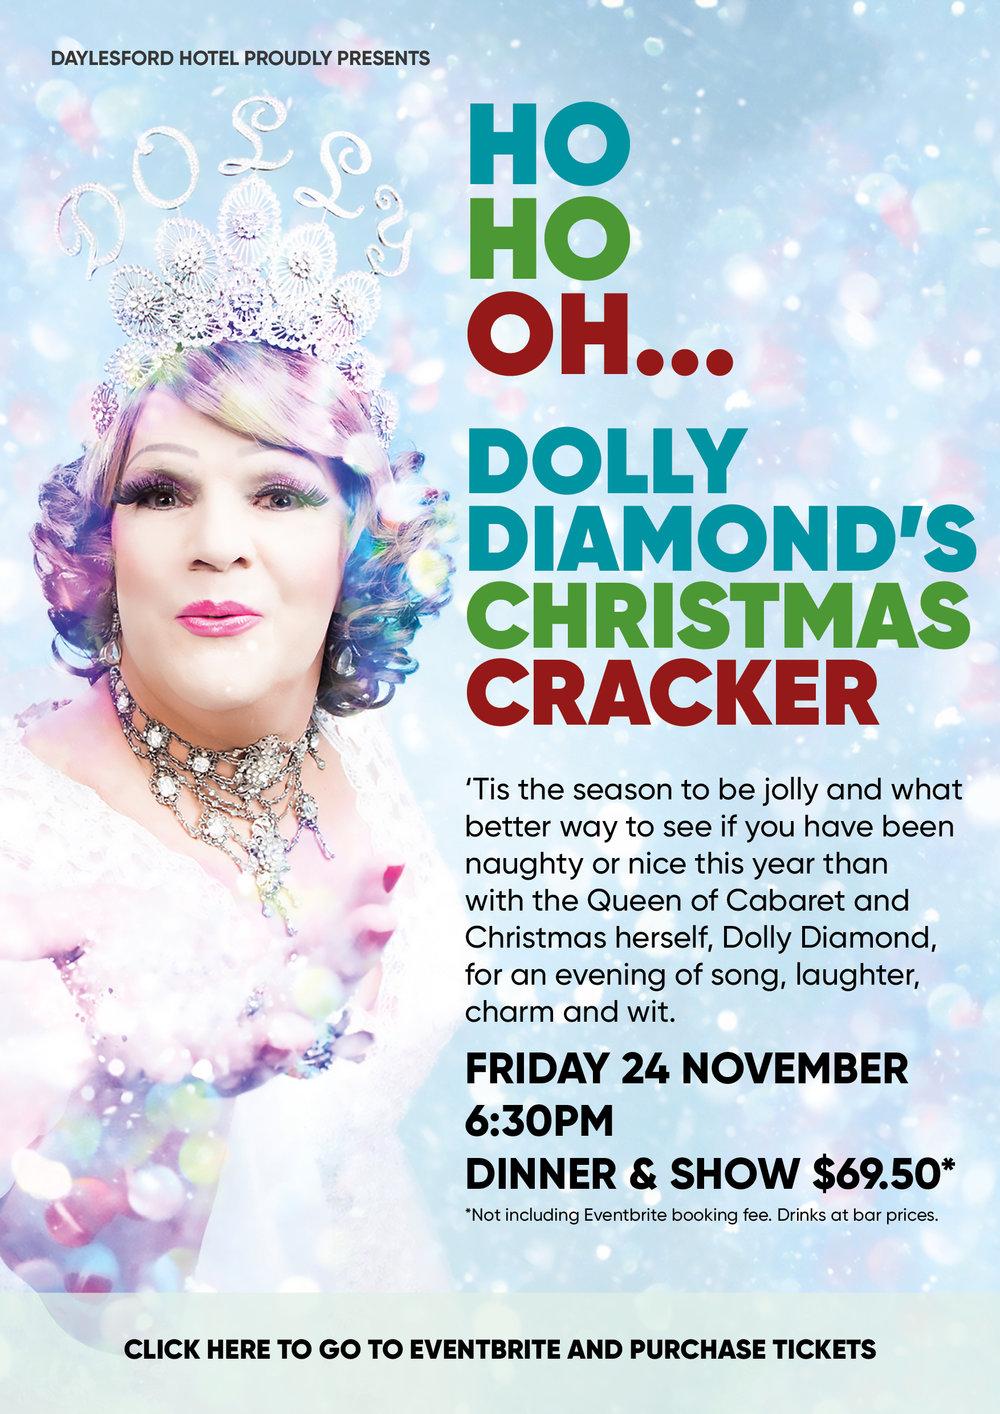 Dolly-Diamond-Christmas-Cracker-link.jpg